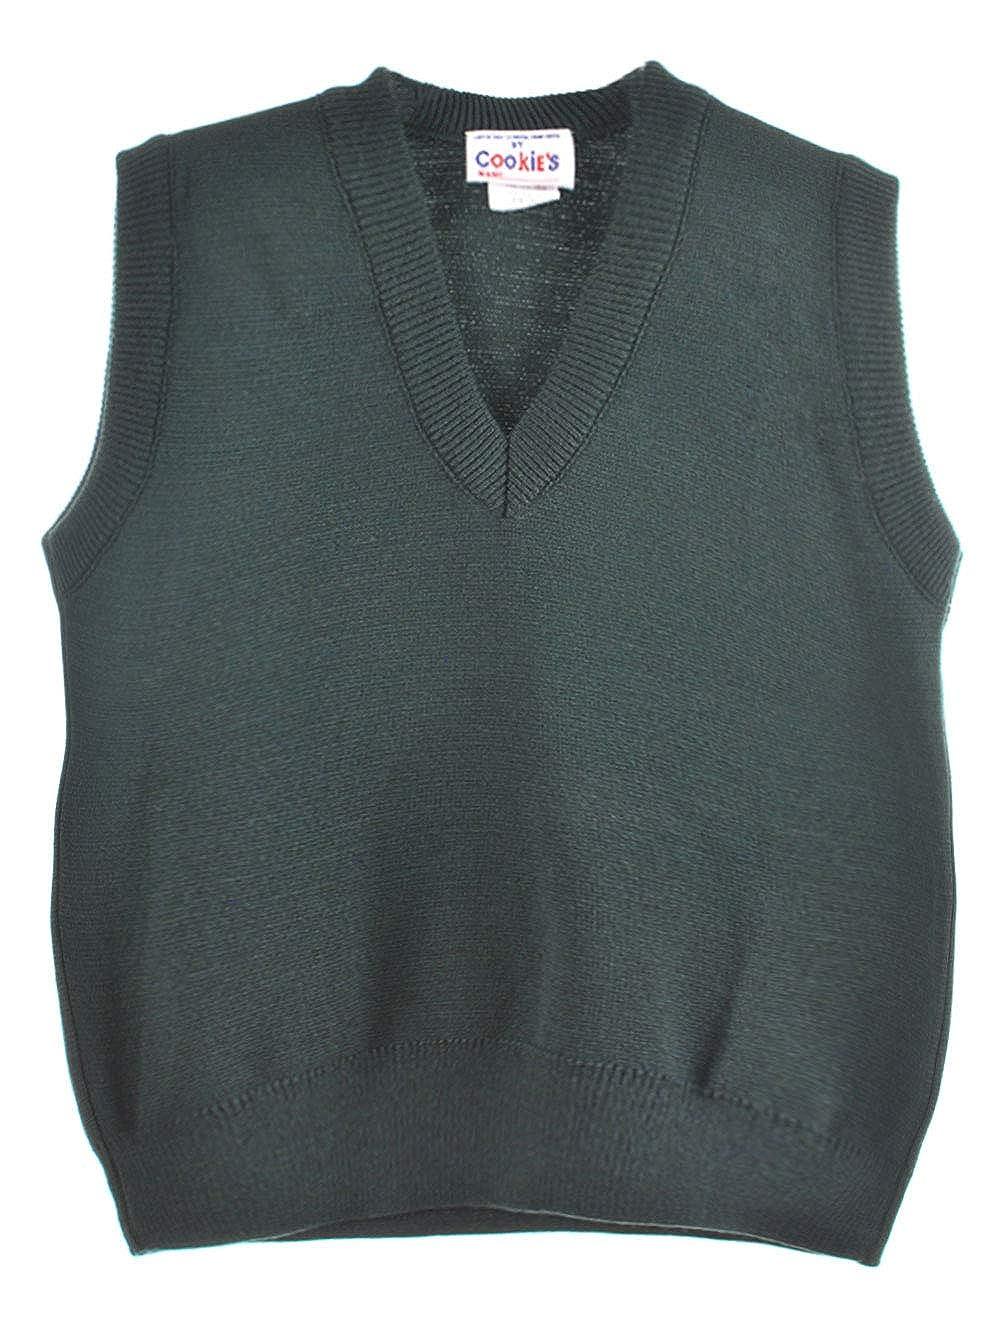 Cookies Brand Unisex V-Neck Sweater Vest